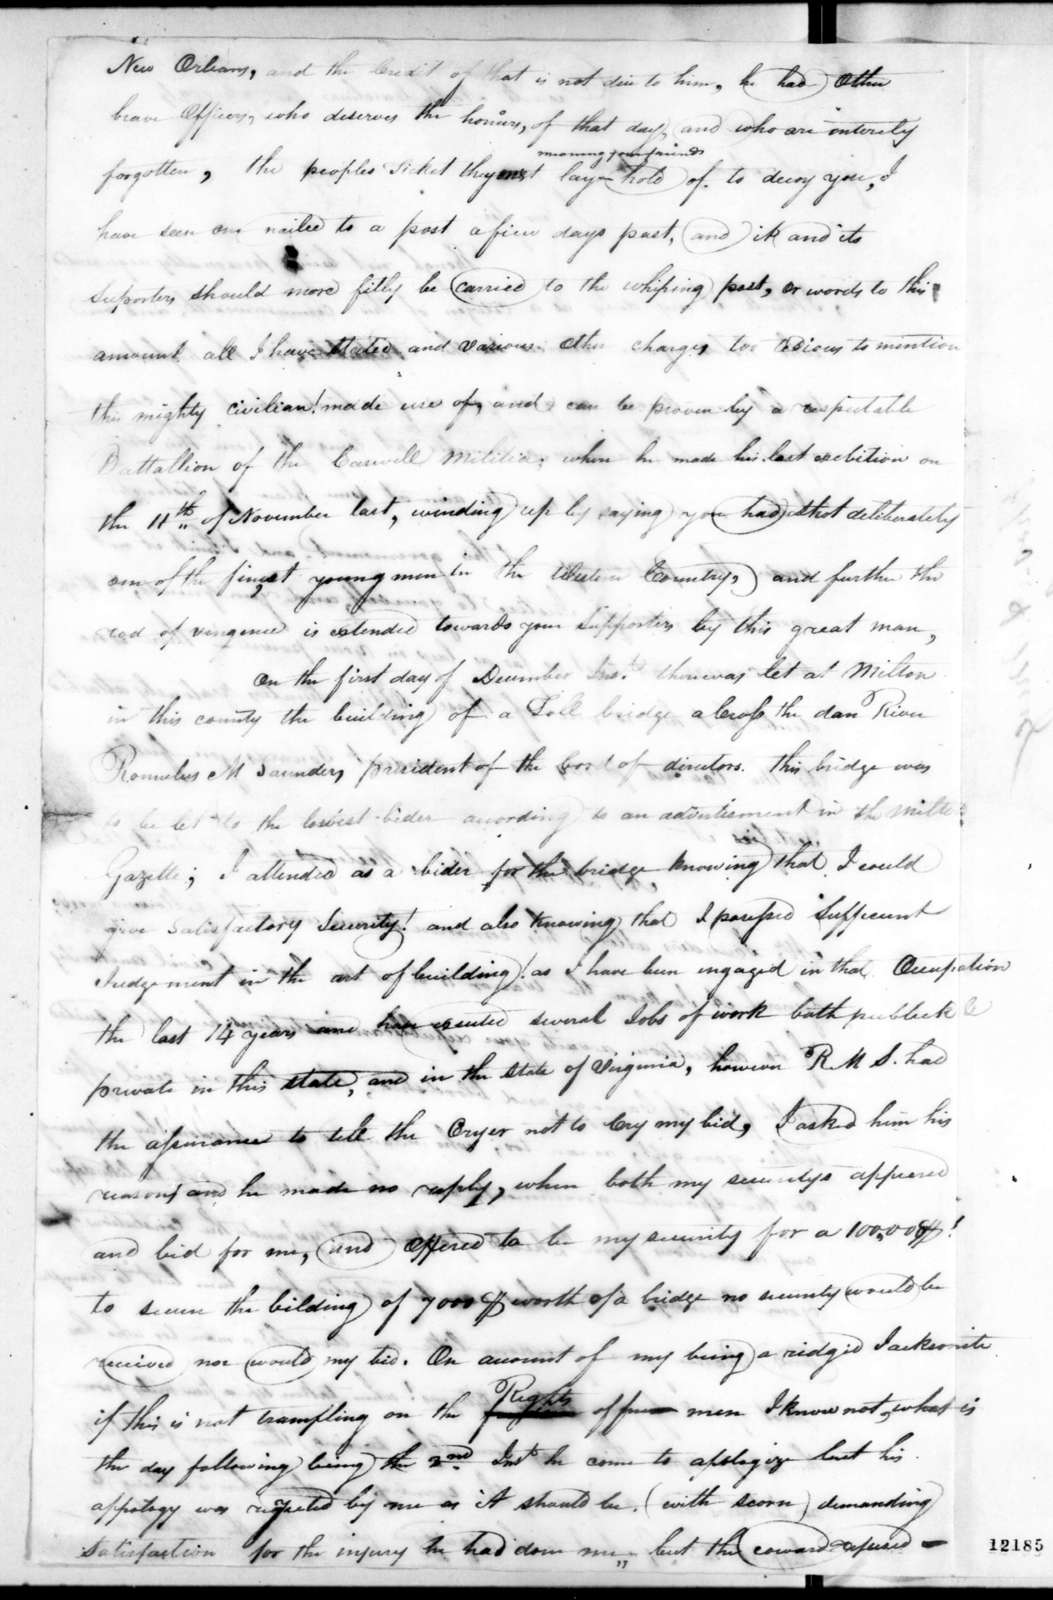 Thomas A. Mera to Andrew Jackson, December 7, 1824